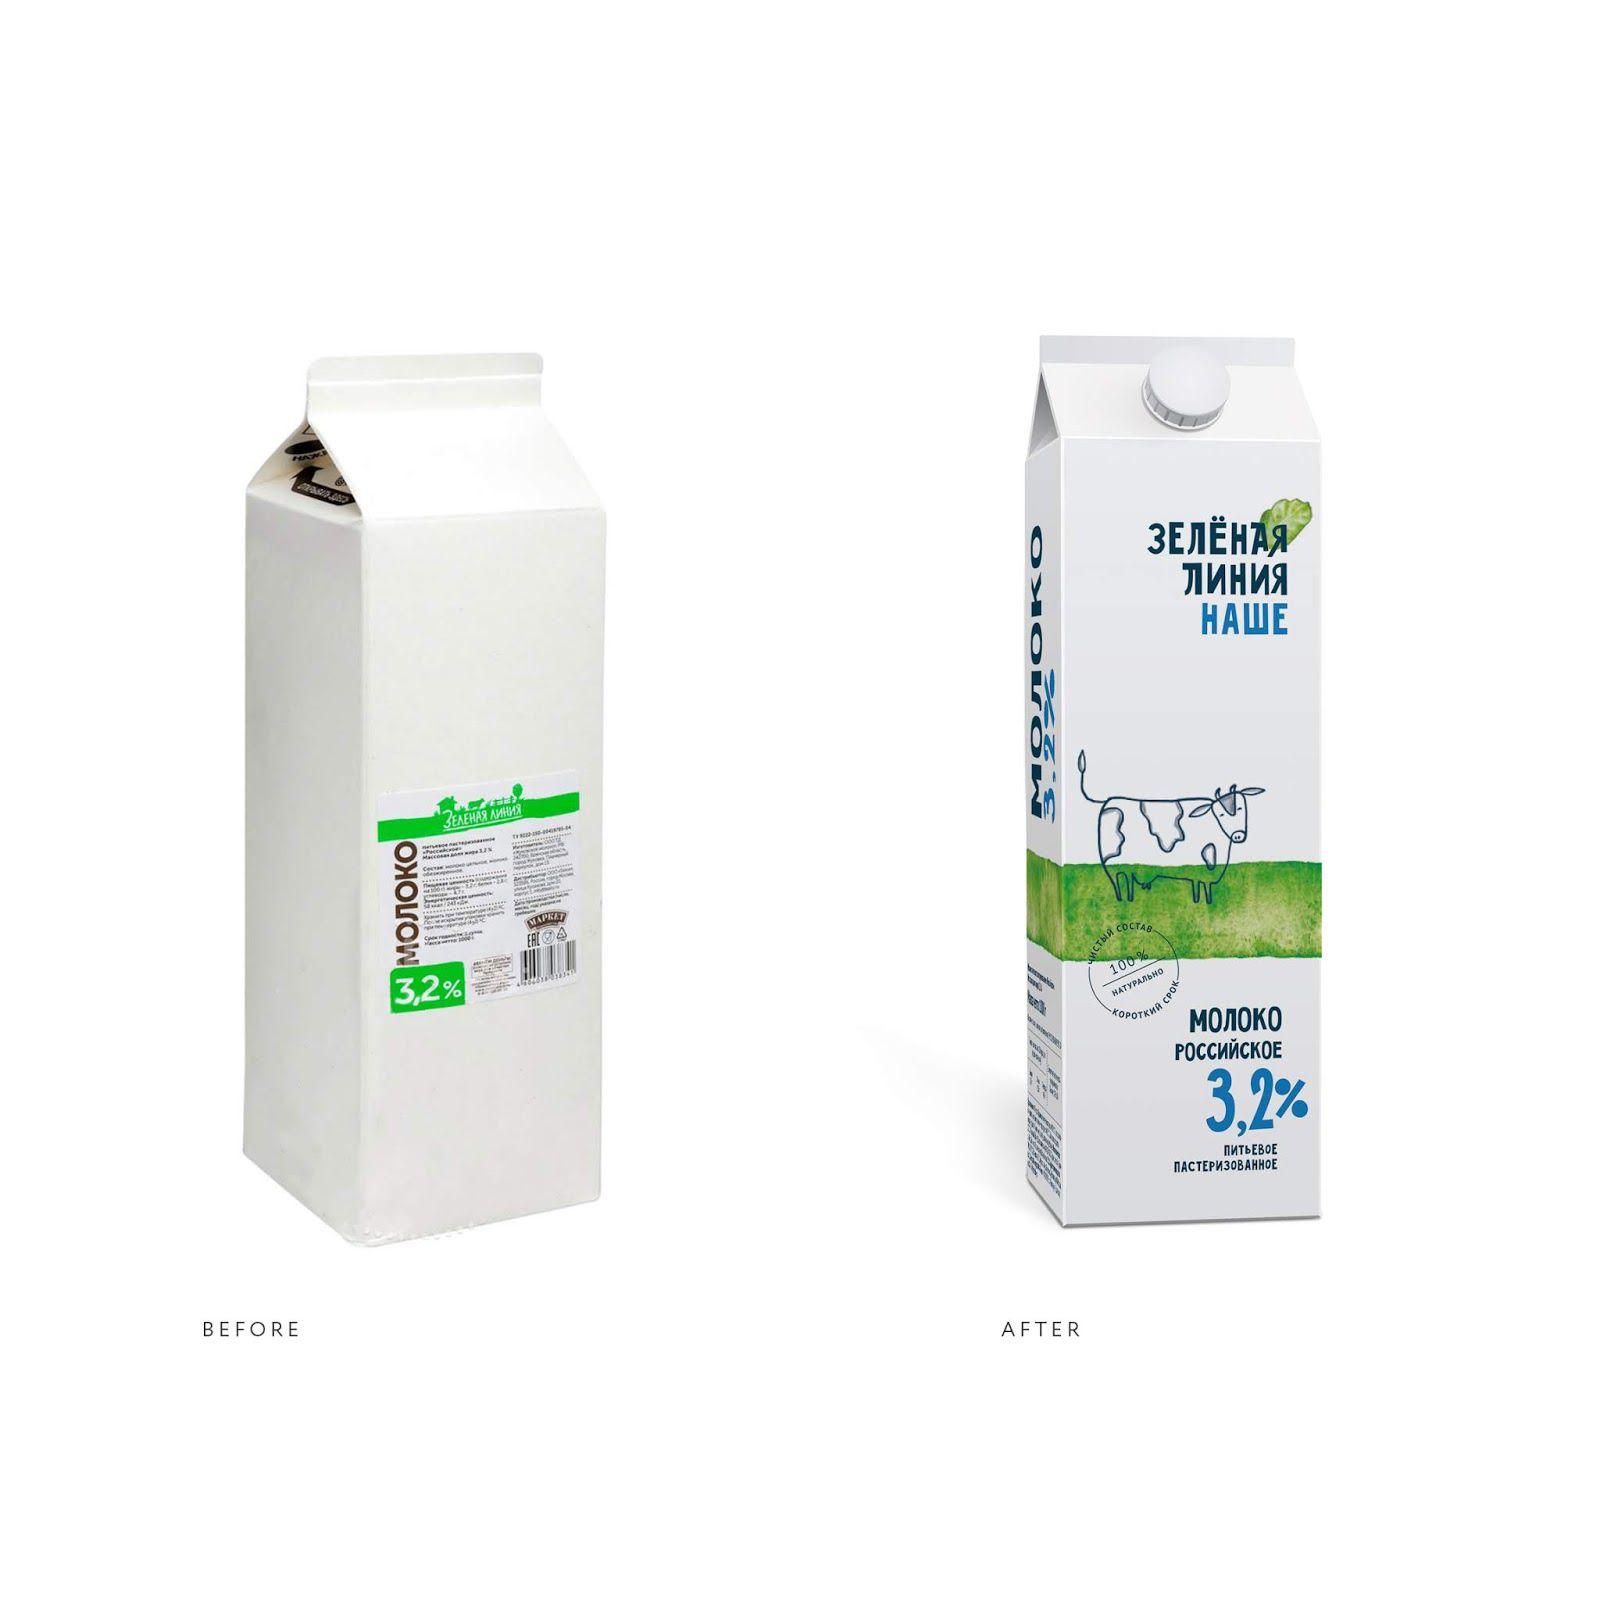 """Zelenaya Liniya"" - Perekrestok/X5 Retail Group (gamme de produits healthy des supermarchés Perekrestok I Design : Ohmybrand, Russie (janvier 2020)"